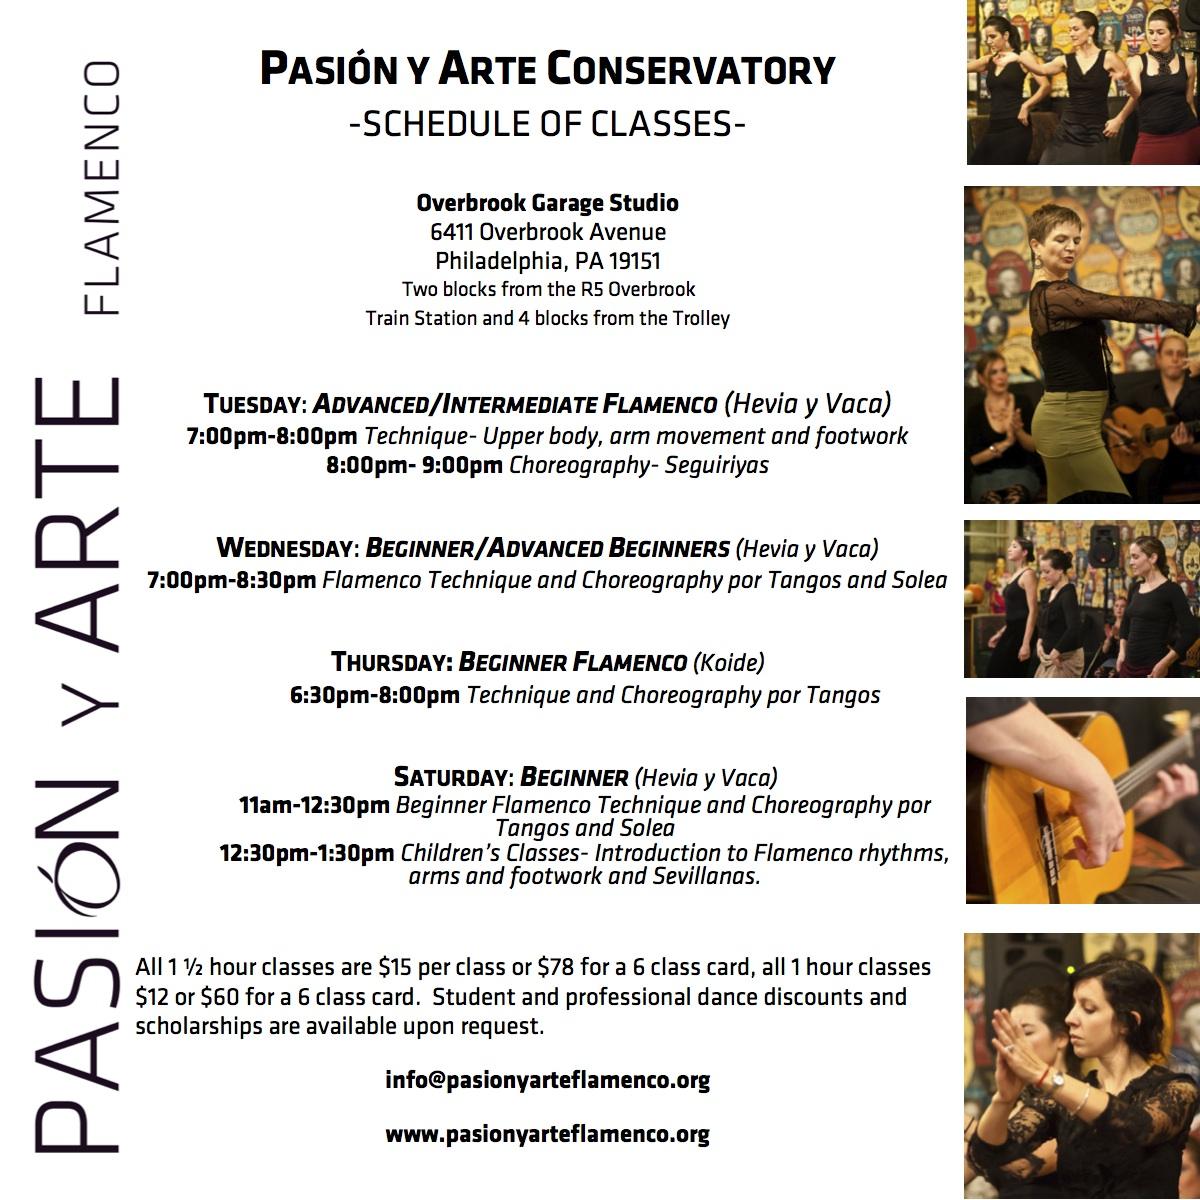 New PyA Conservatory Schedule